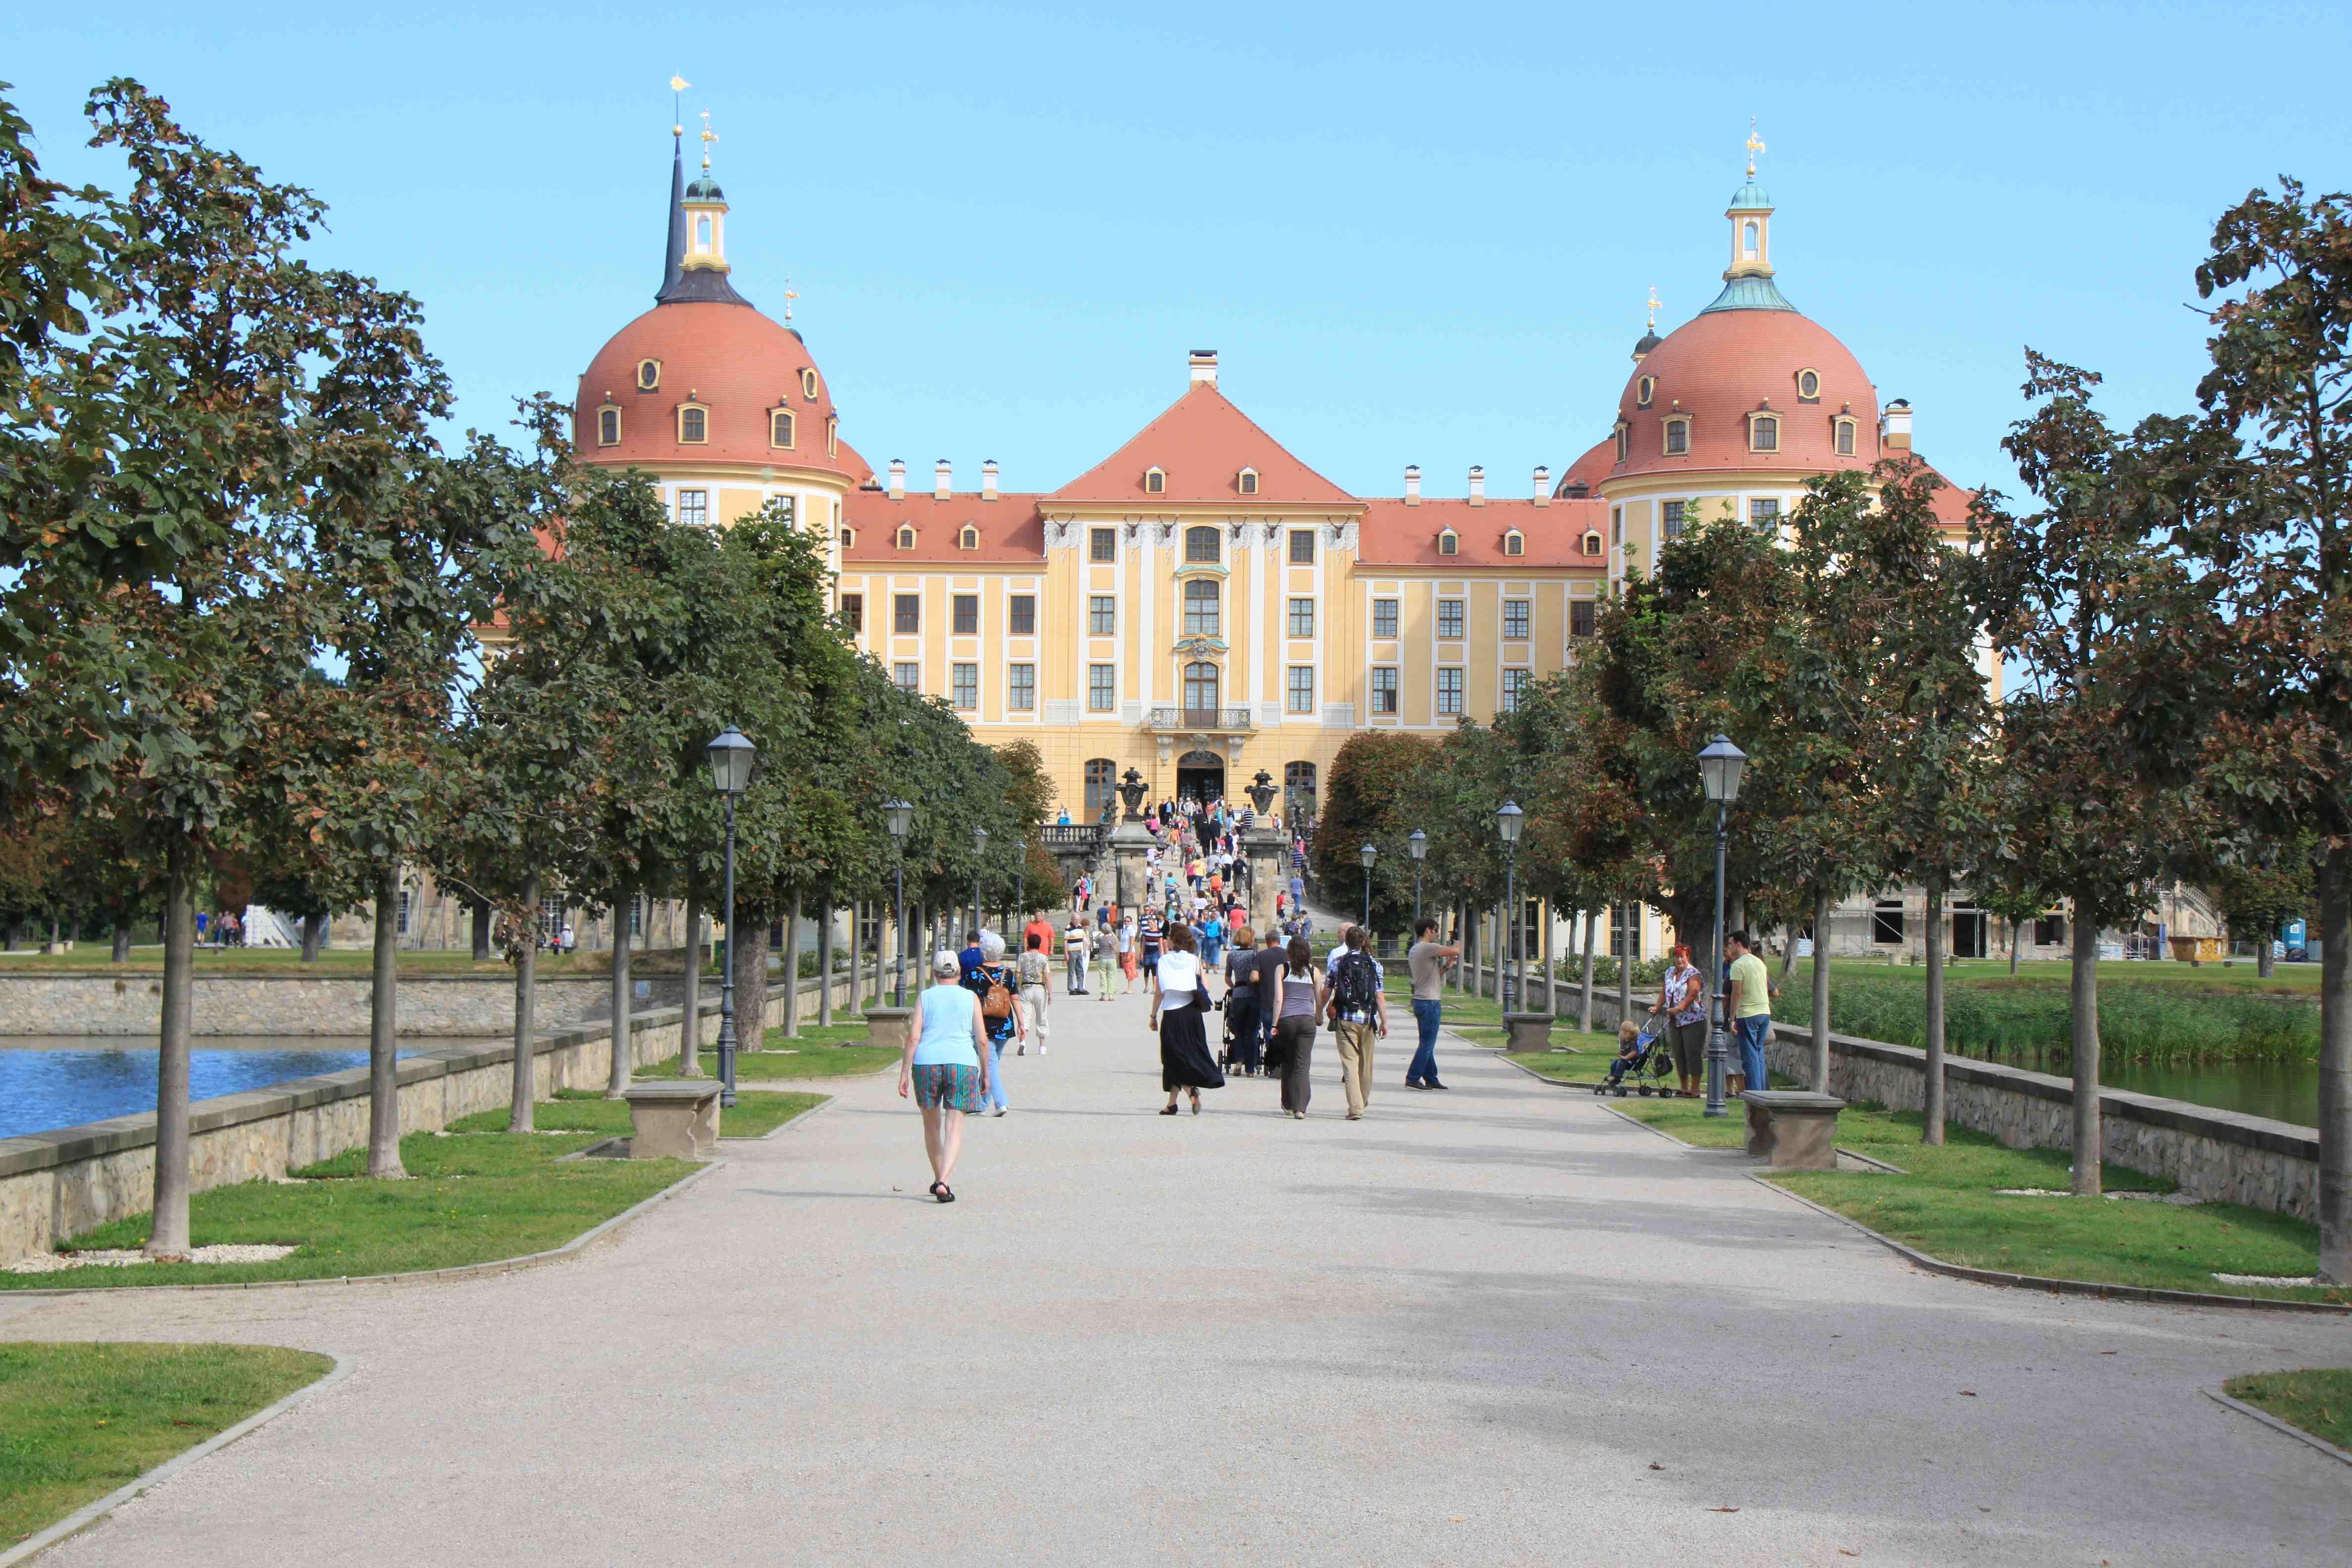 innen residenzschloss dresden